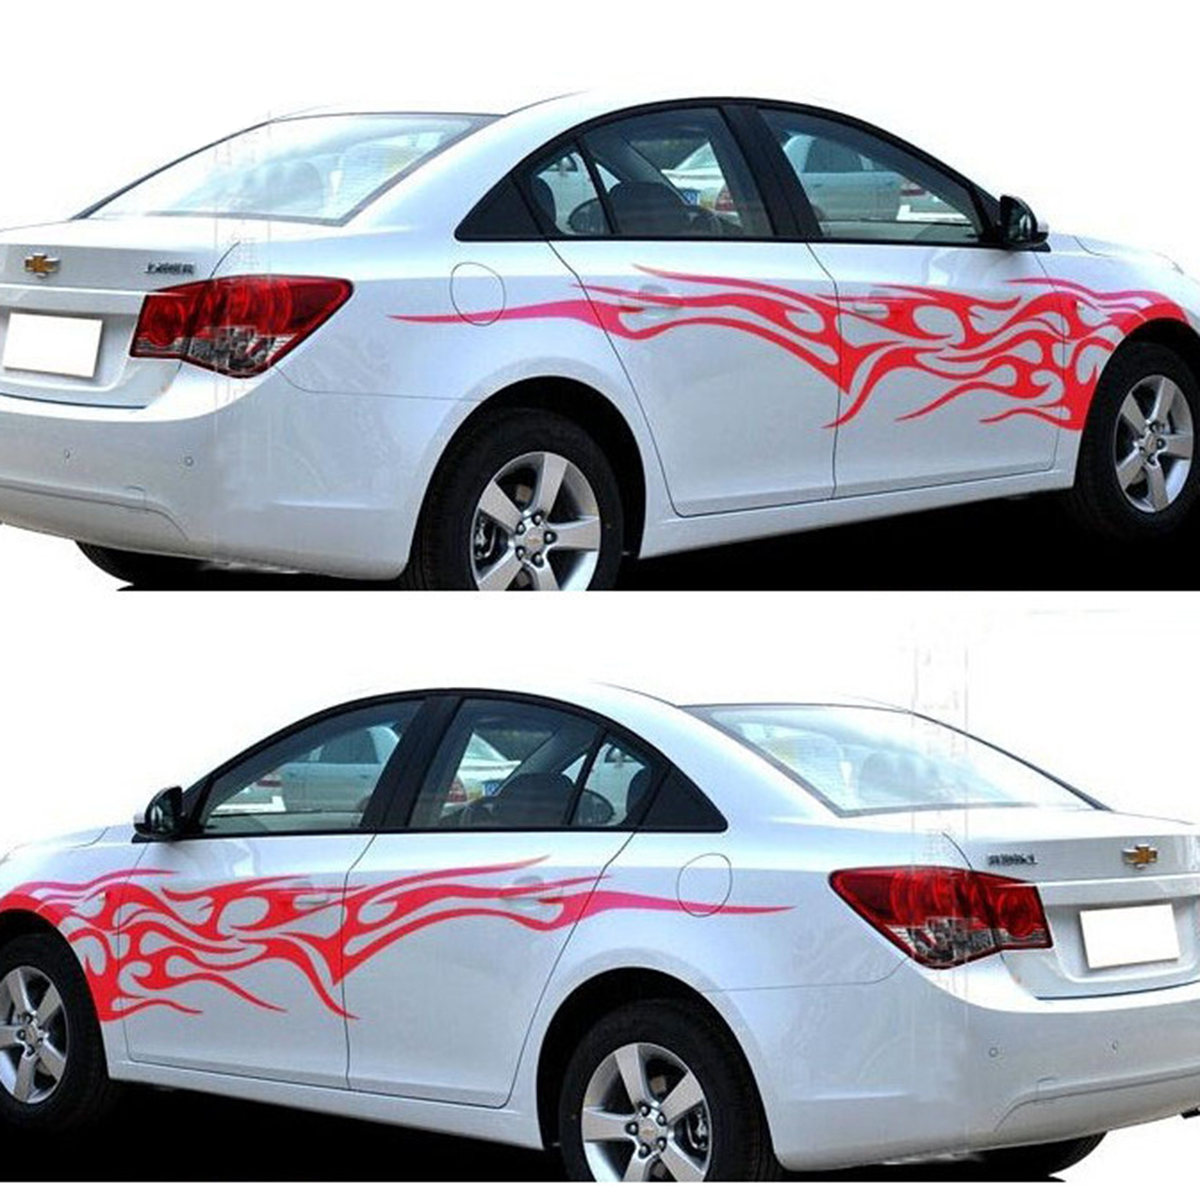 Car body sticker design singapore - Tribal Flames Graphics Vinyl Tattoos Car Truck Decal Vinyl Graphics Body Vinyl Stickers